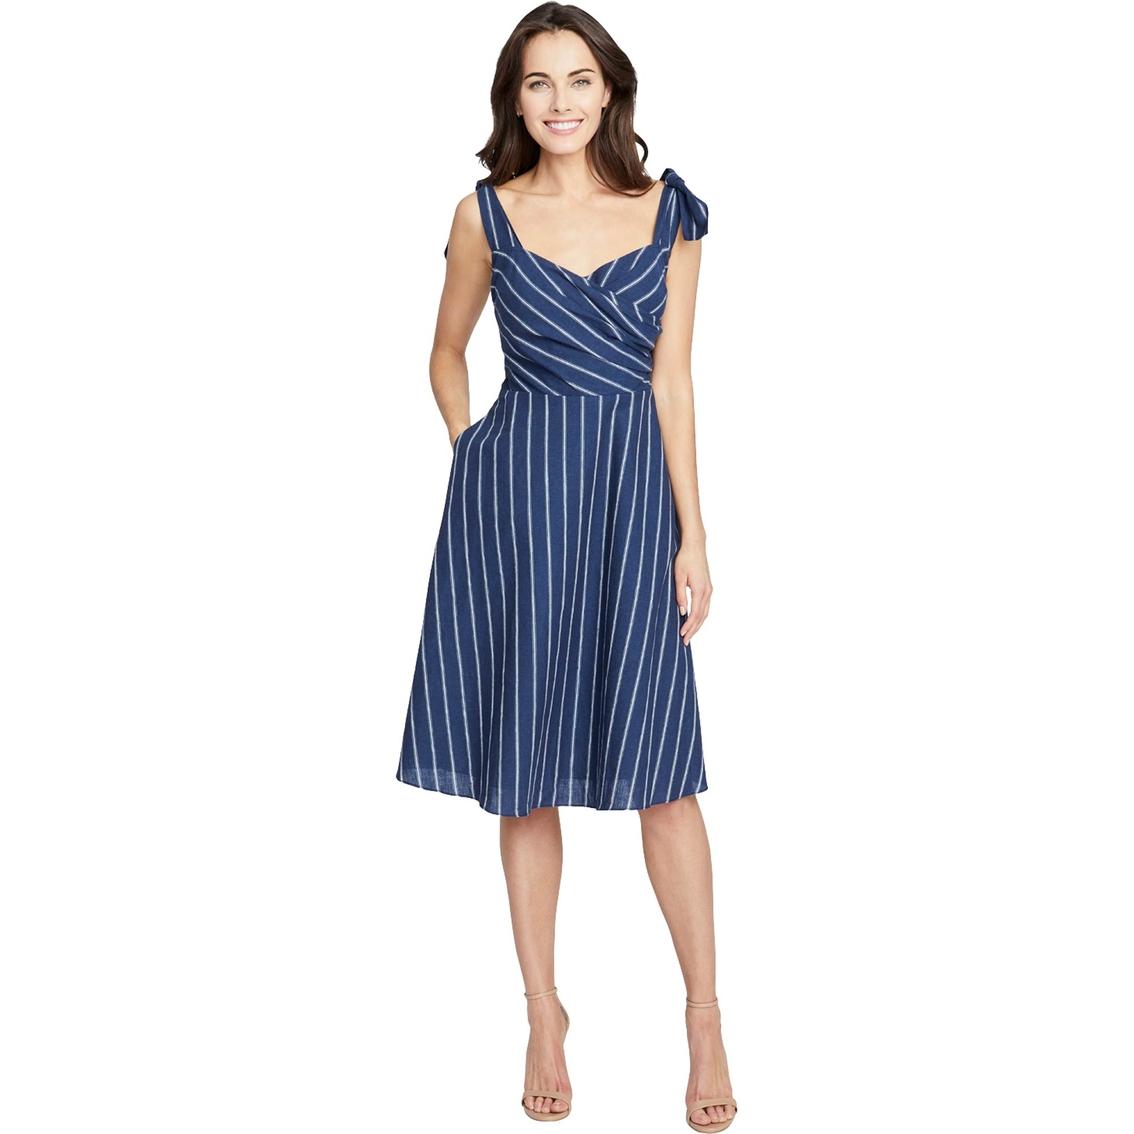 Rachel Roy Discount Gowns: Rachel Roy Kate Dress